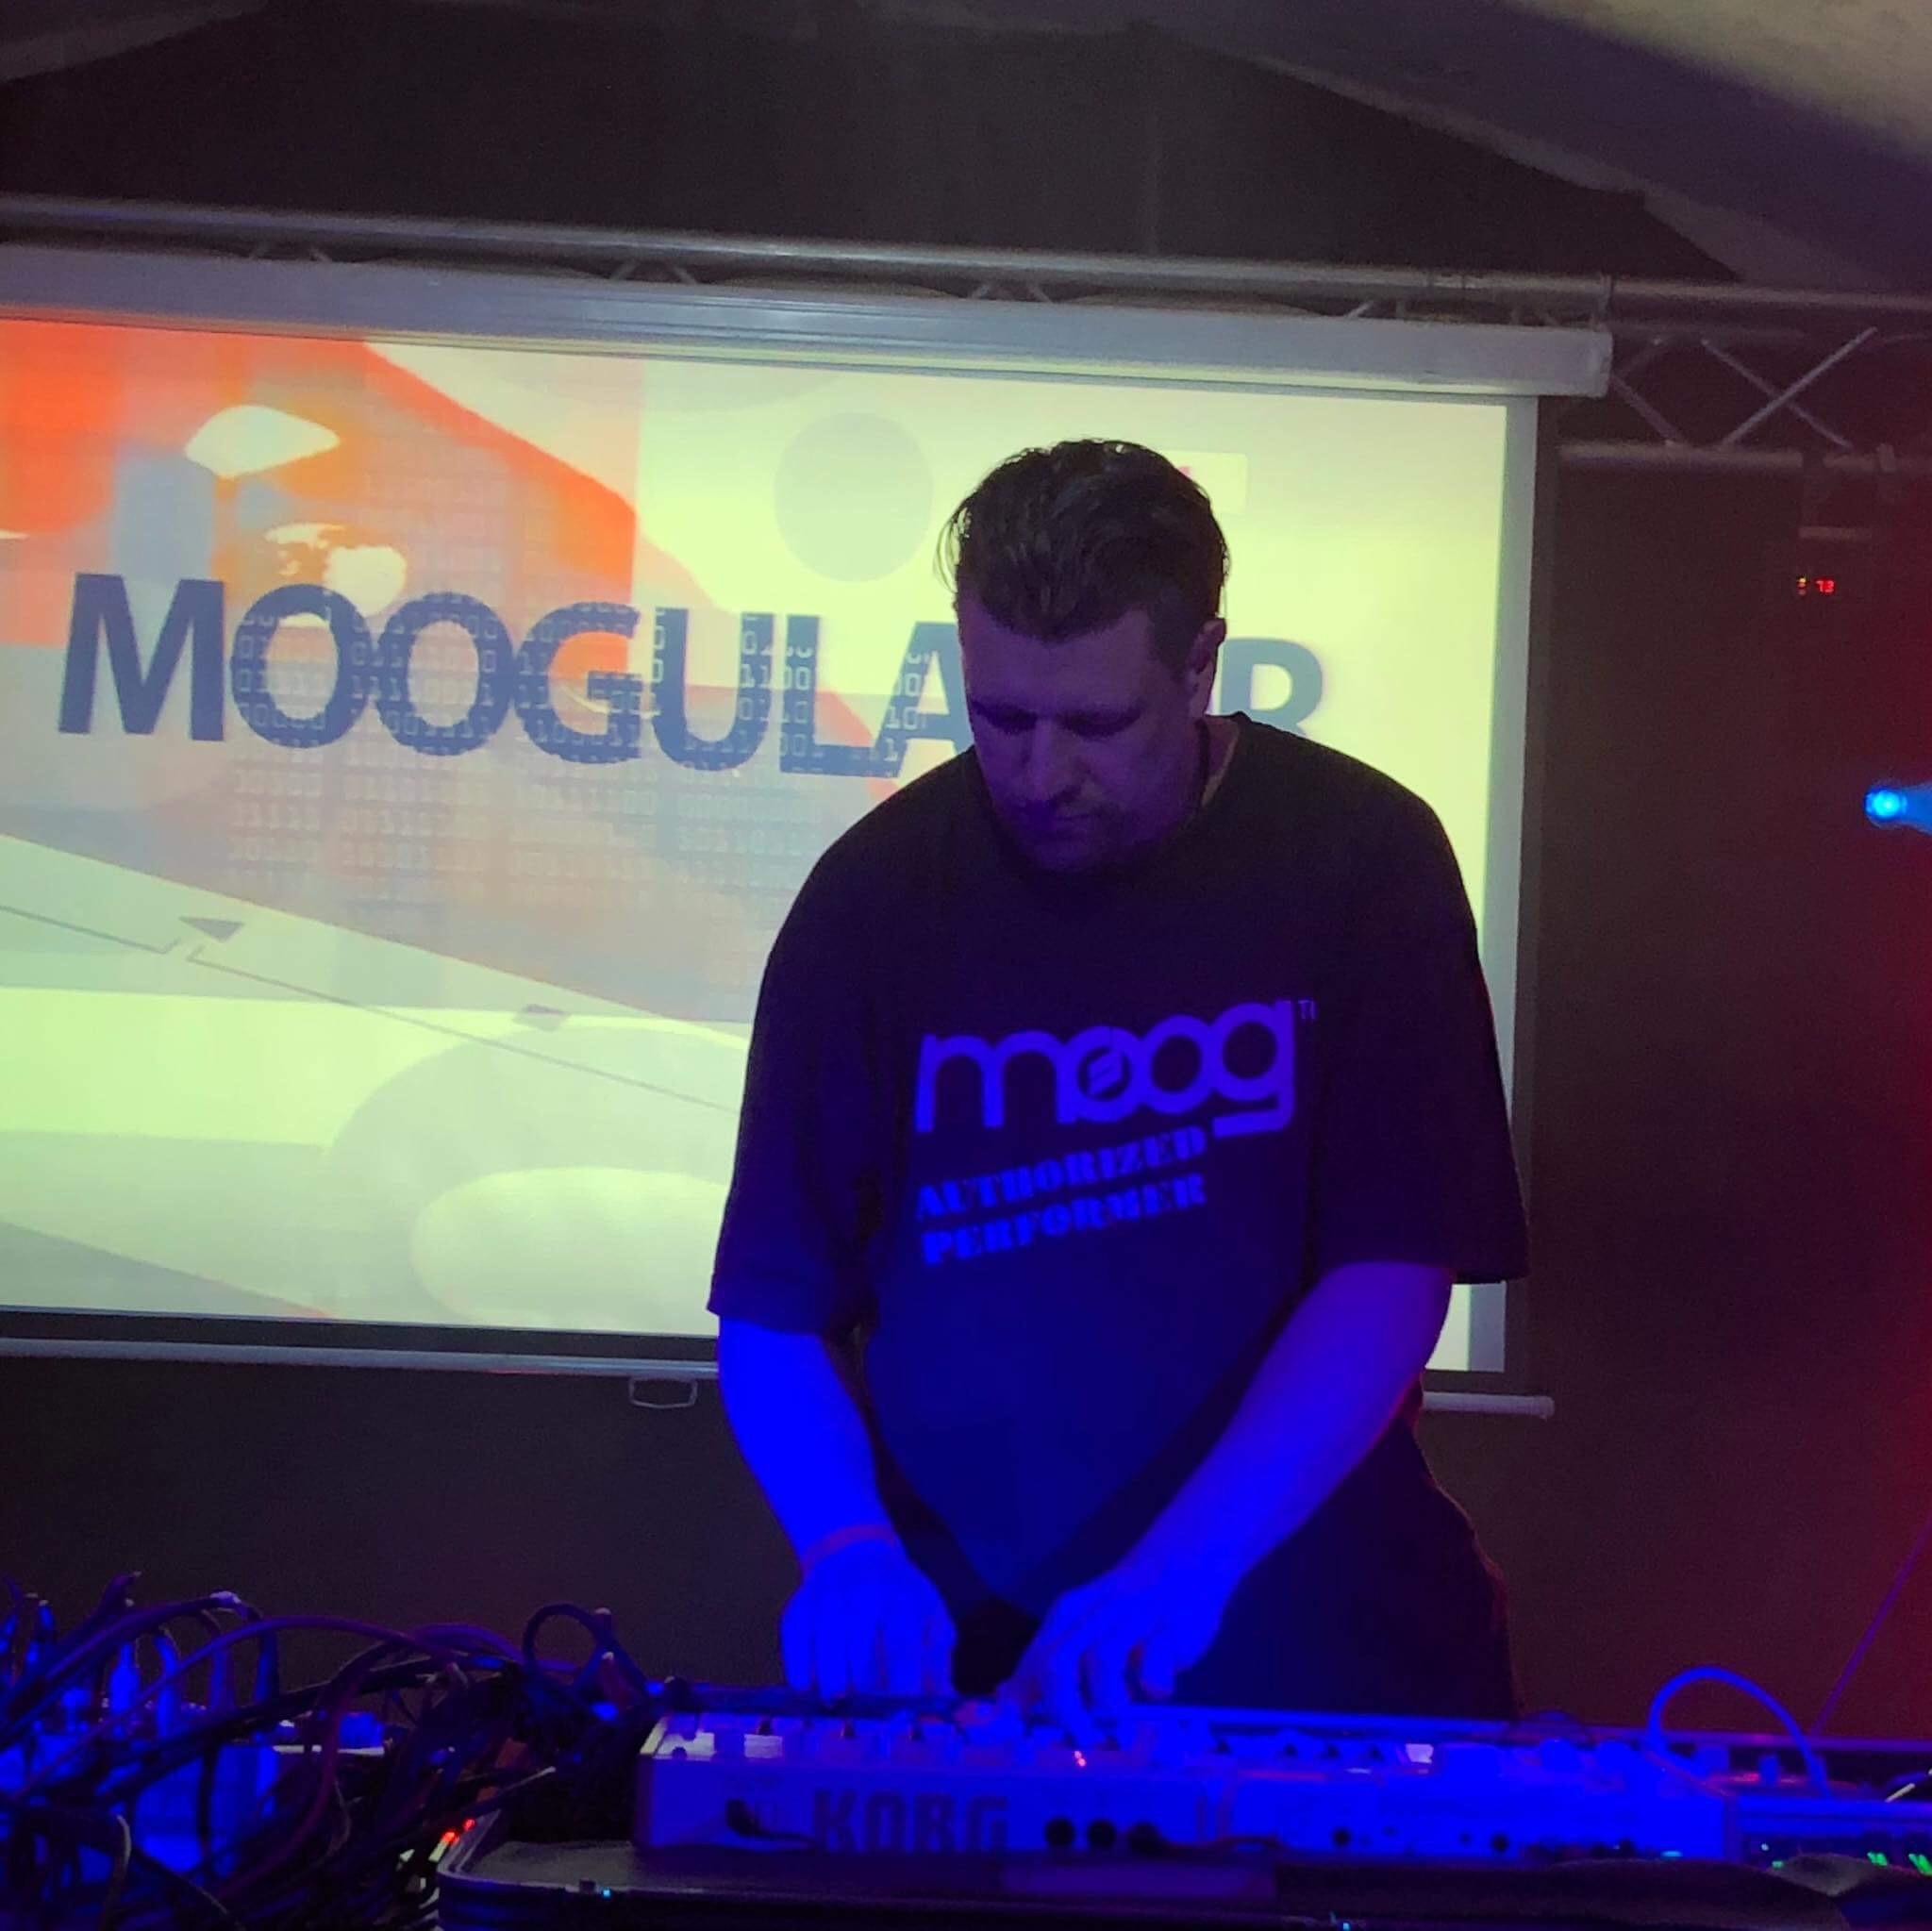 moogulator Elektroanschlag2018